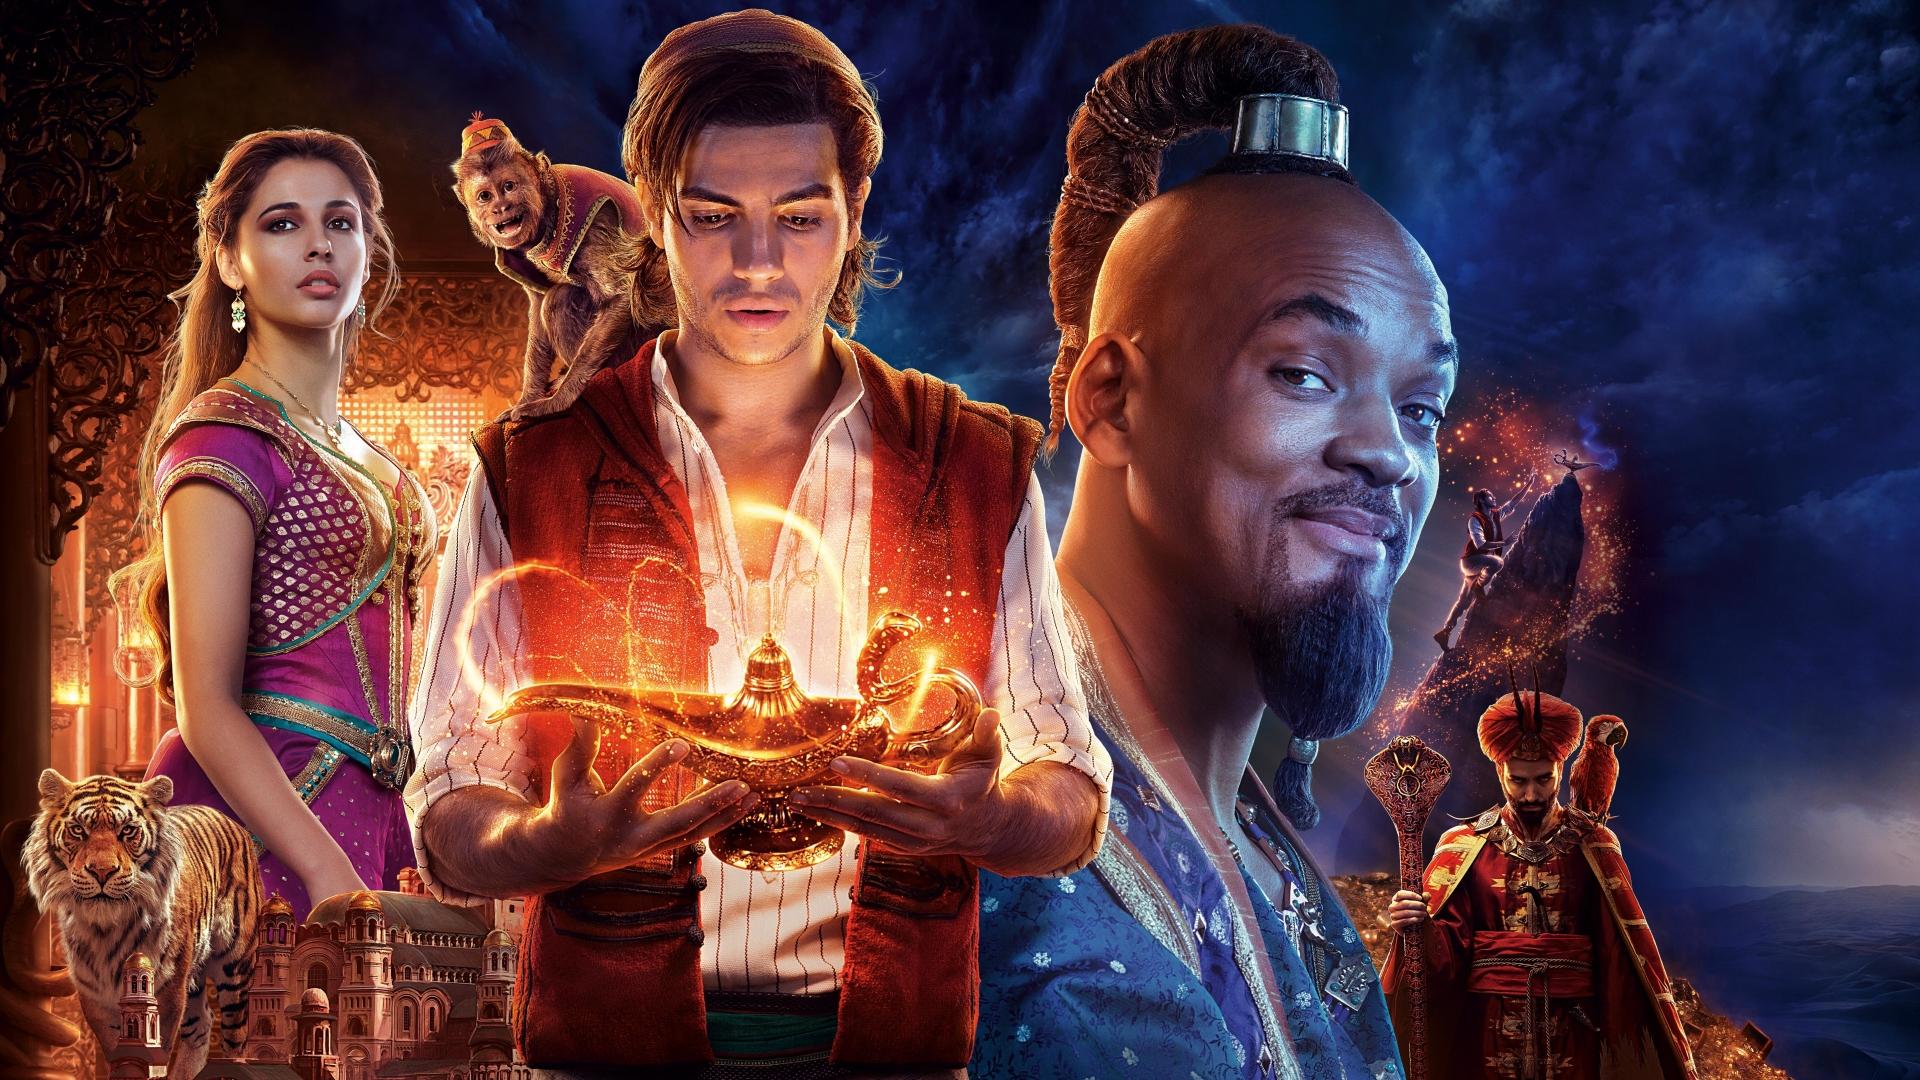 1920x1080 Aladdin Movie 2019 1080P Laptop Full HD ...